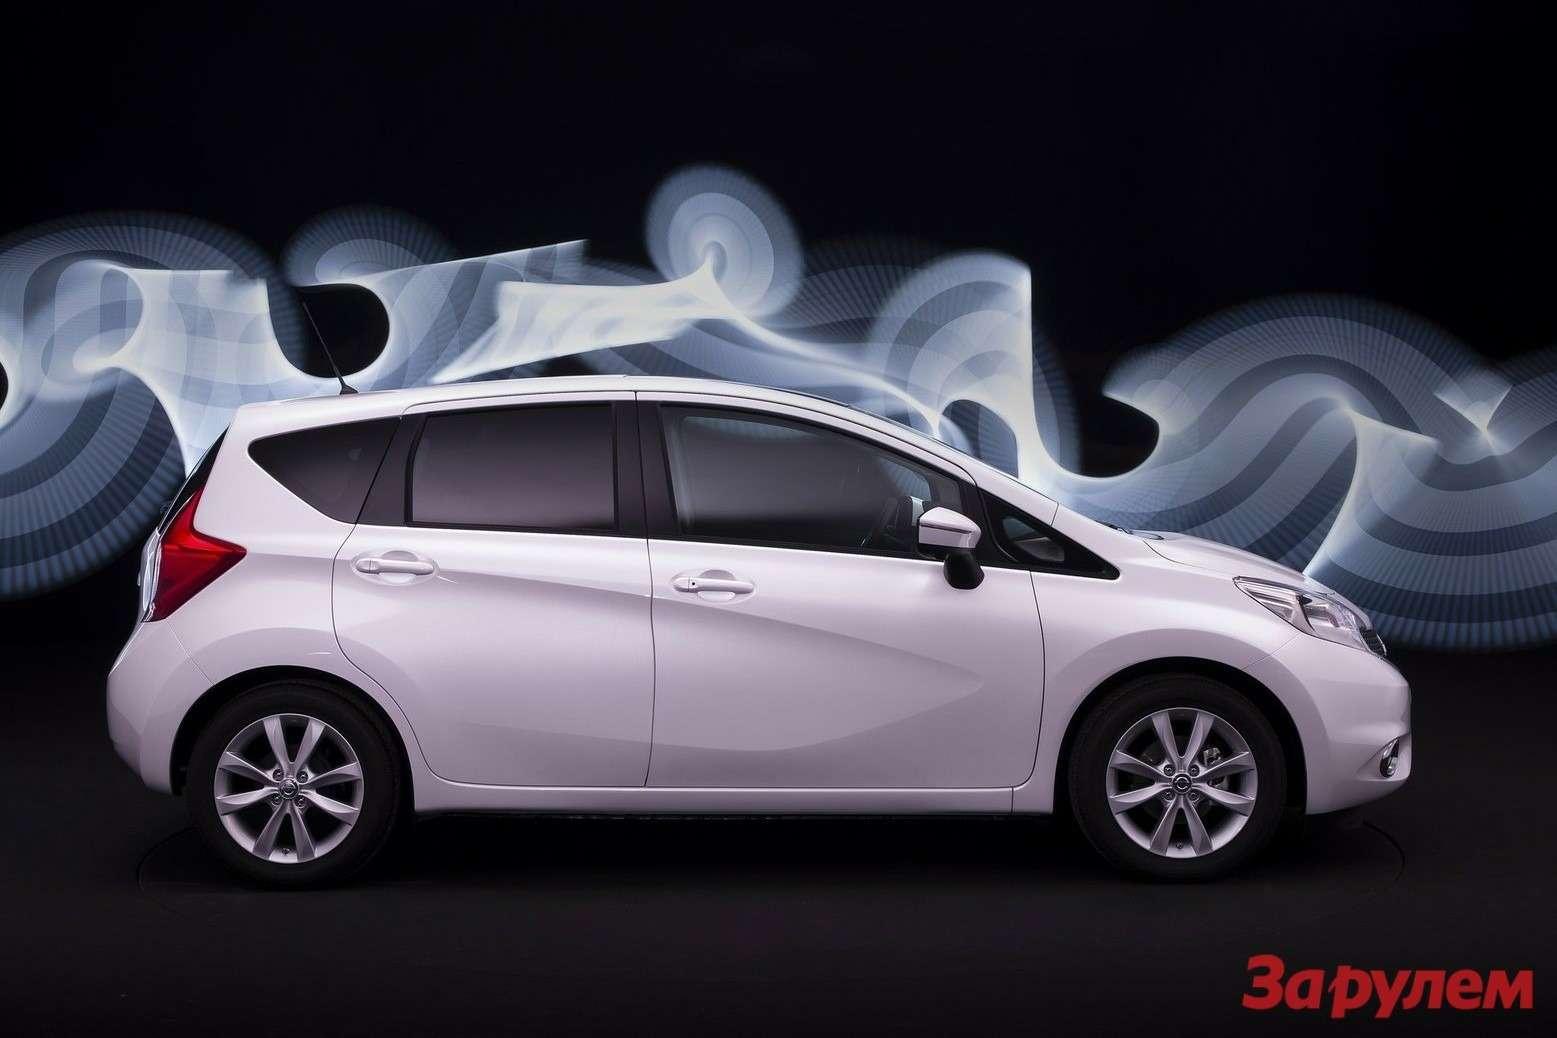 Nissan-Note_2014_1600x1200_wallpaper_05